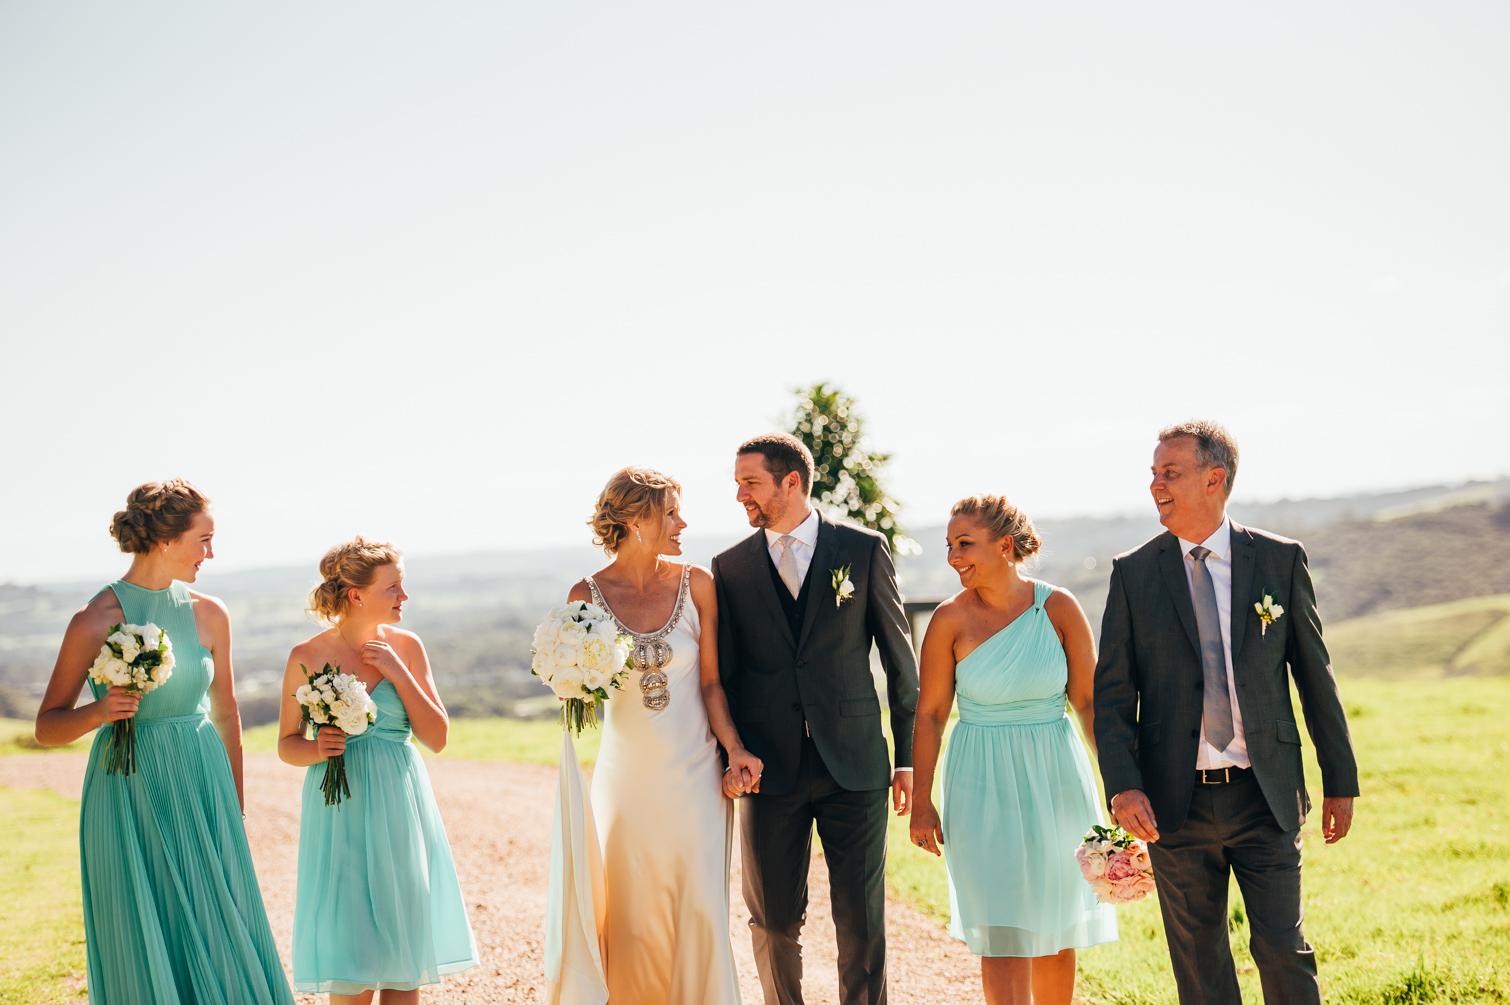 Byron_View_Wedding_Venue-34.jpg